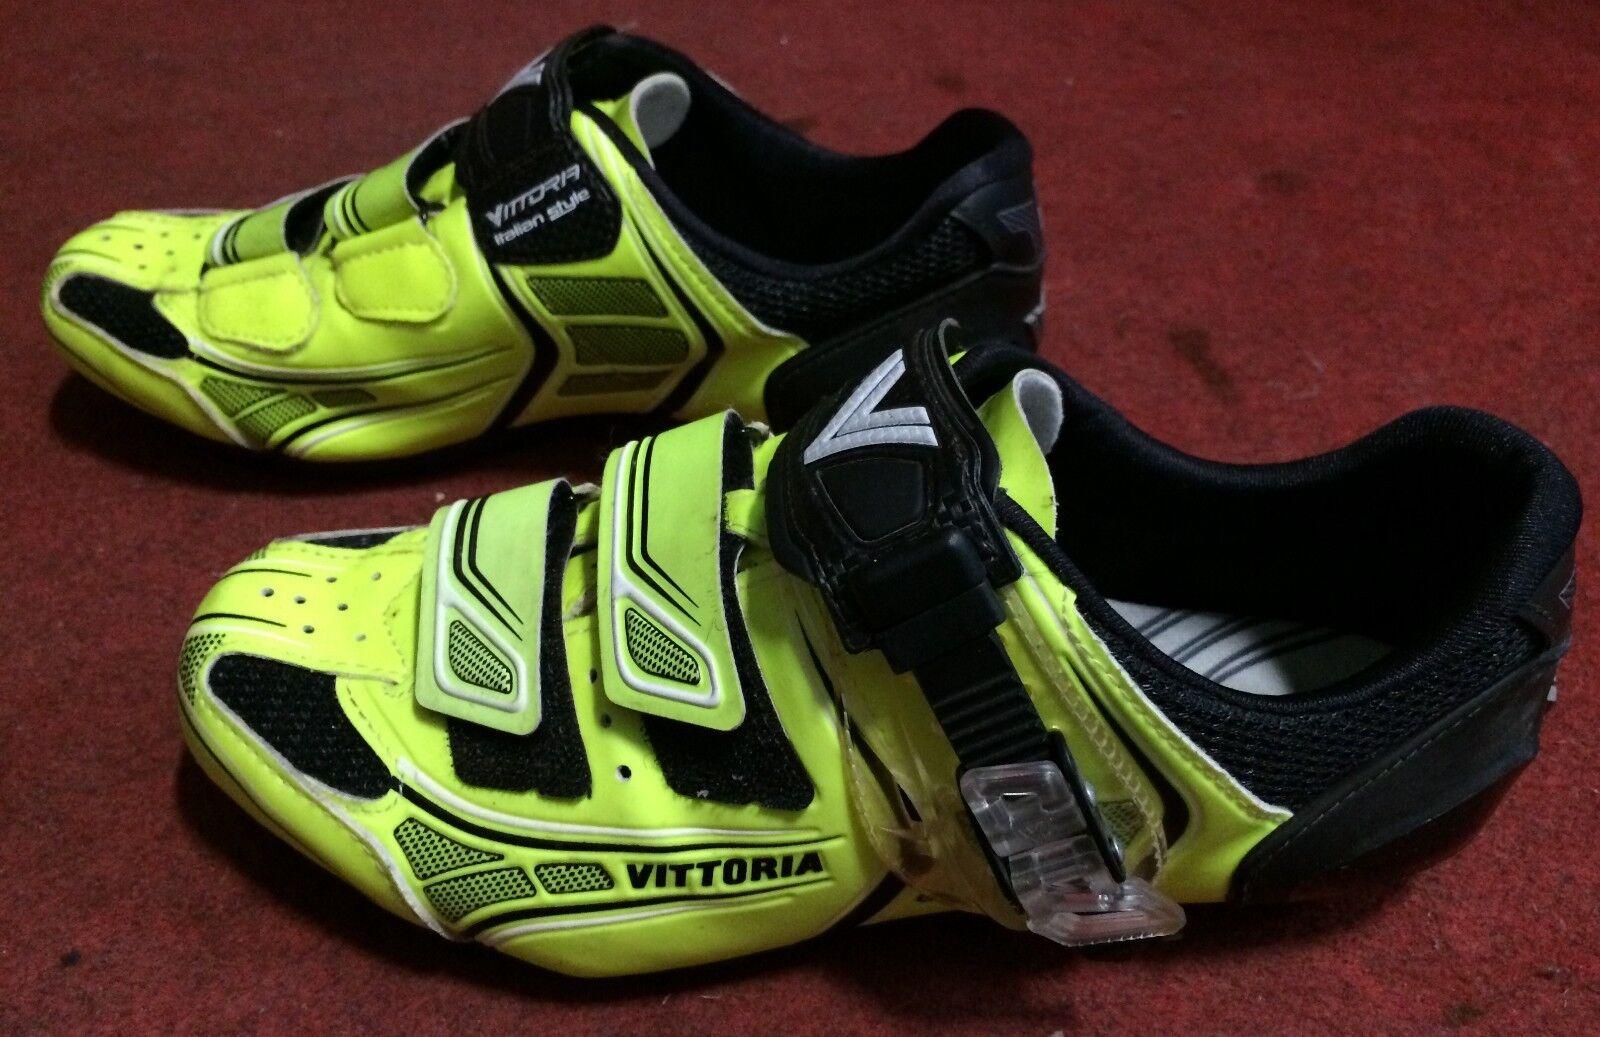 shoes bici corsa Vittoria Brave road bike shoes 41 yellow yellow fluo